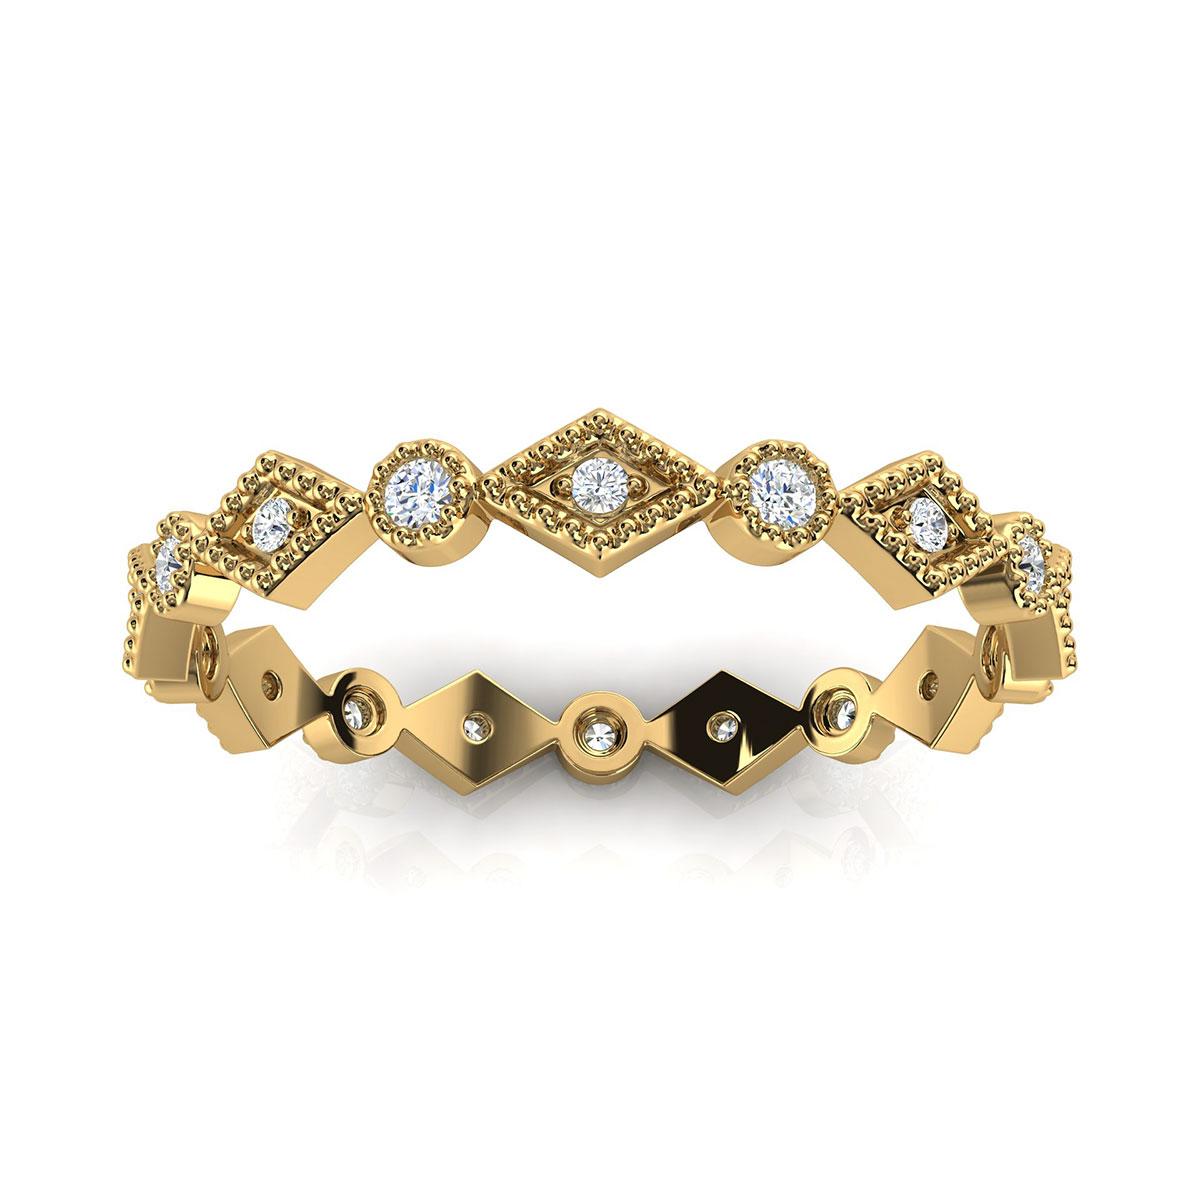 14K Yellow Gold Delicate Nilian Milgrain Eternity Diamond Ring (1/10 ct. tw)